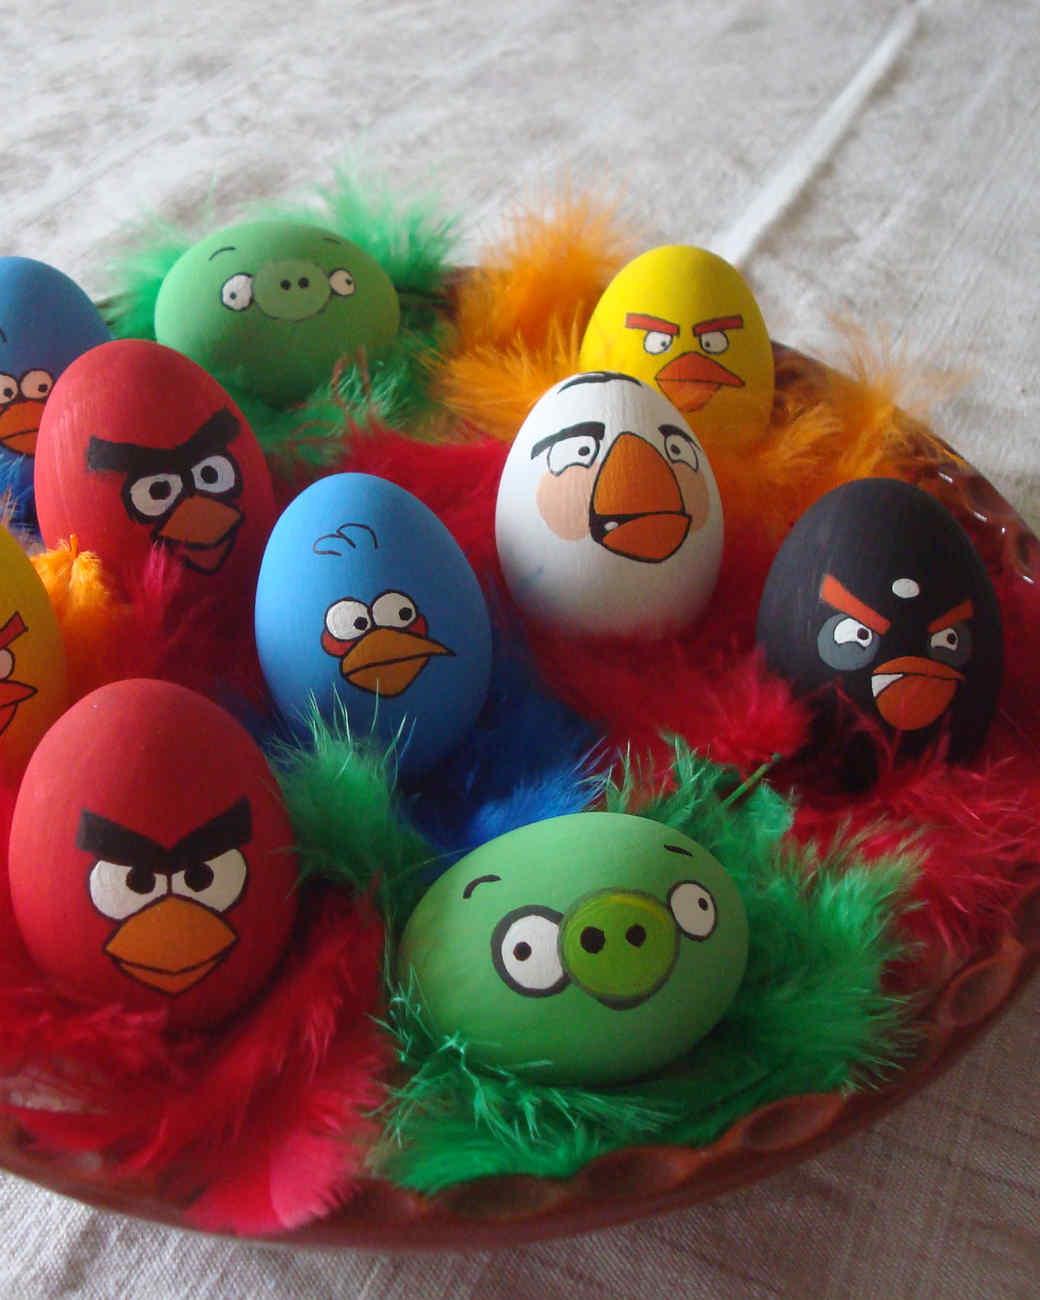 marthas-egg-hunt-radmila-curic-1-0414.jpg